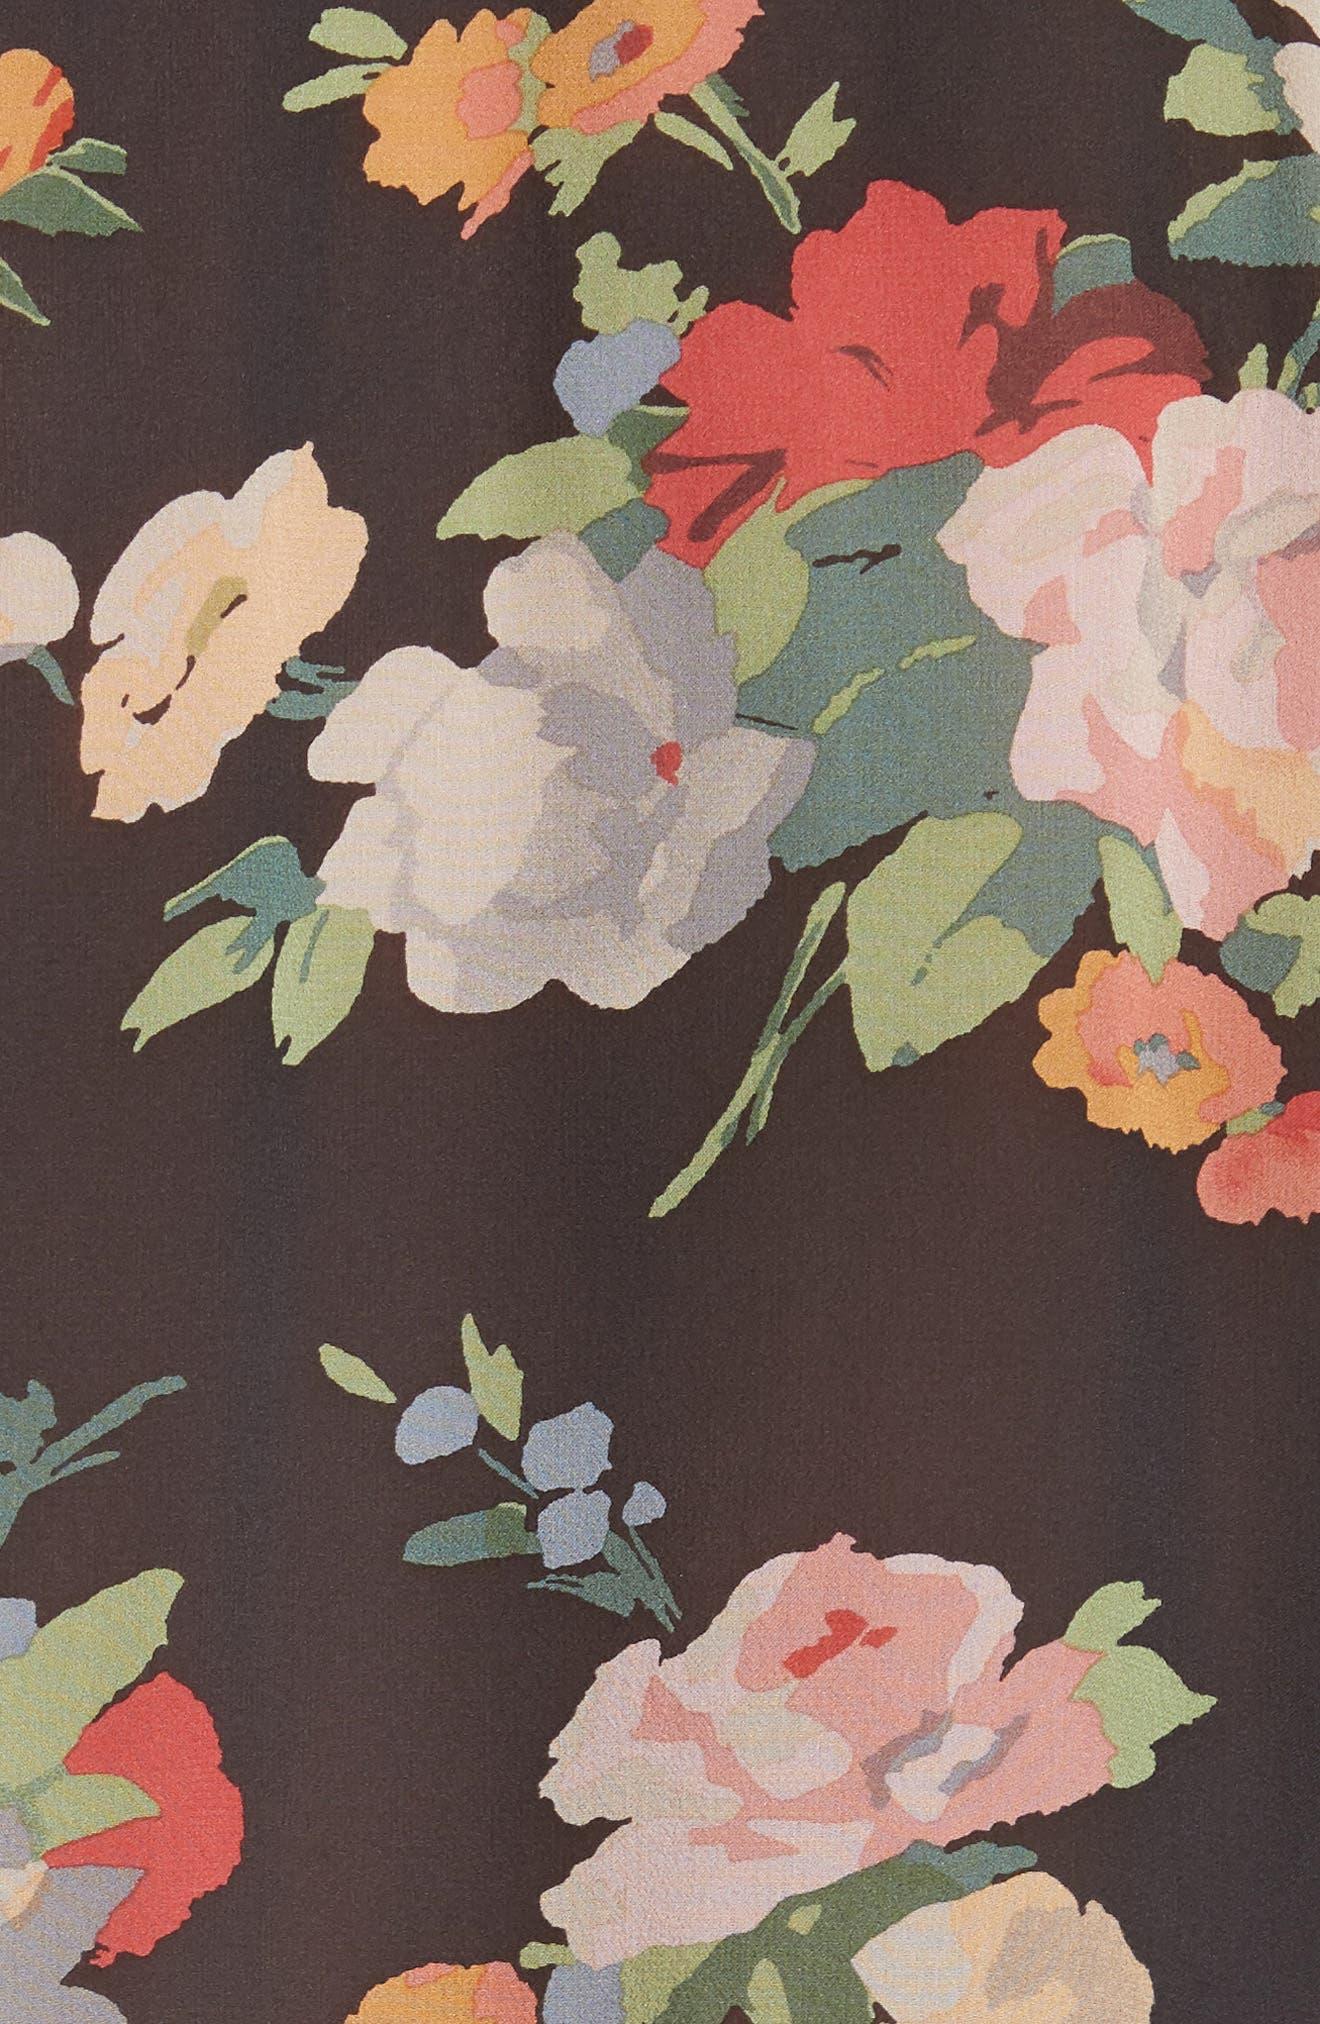 Acadia Print Silk Blouse,                             Alternate thumbnail 5, color,                             FLORAL PRINT